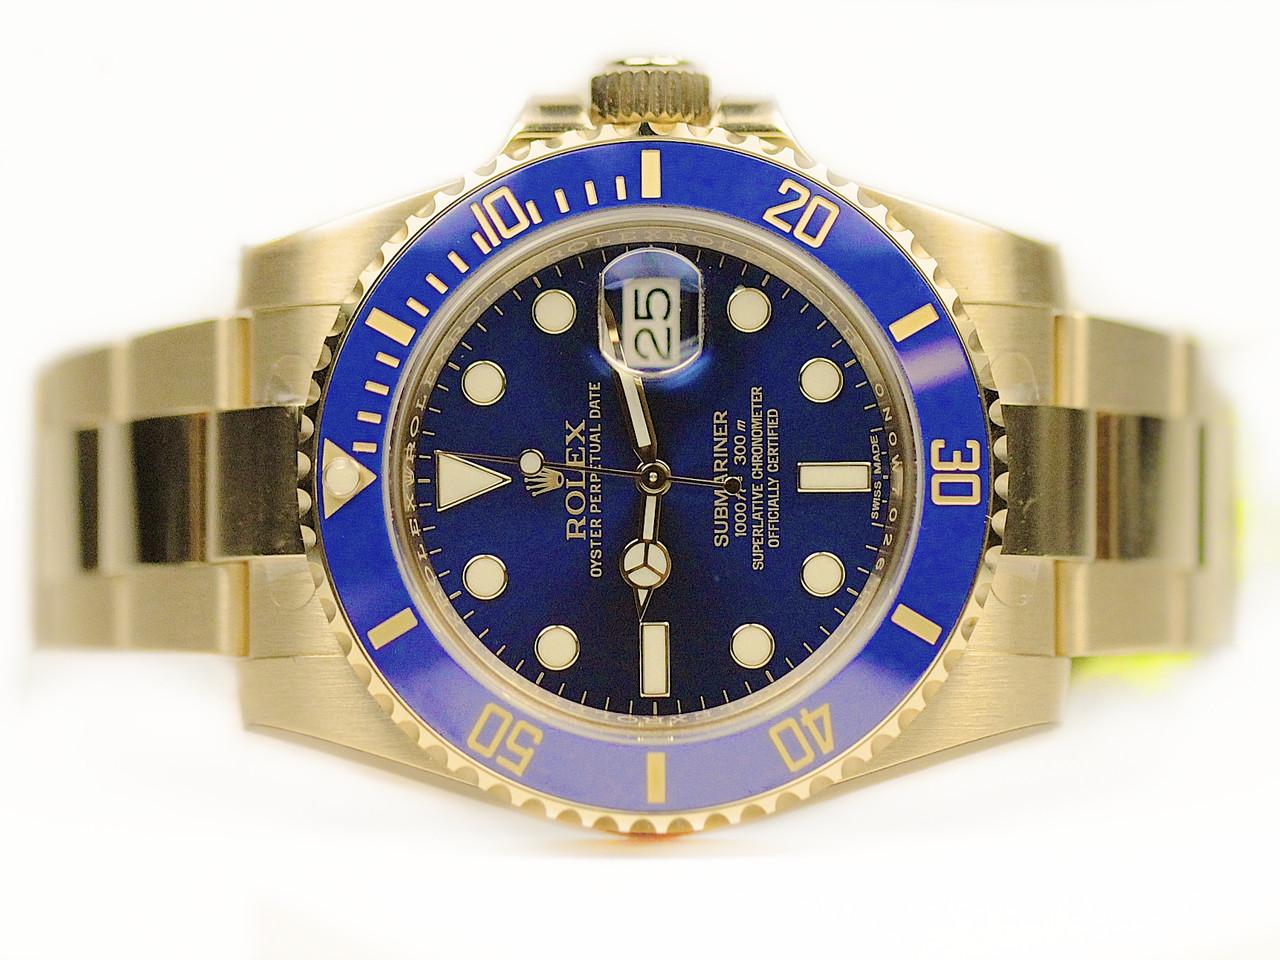 Rolex Submariner Blue Gold Price